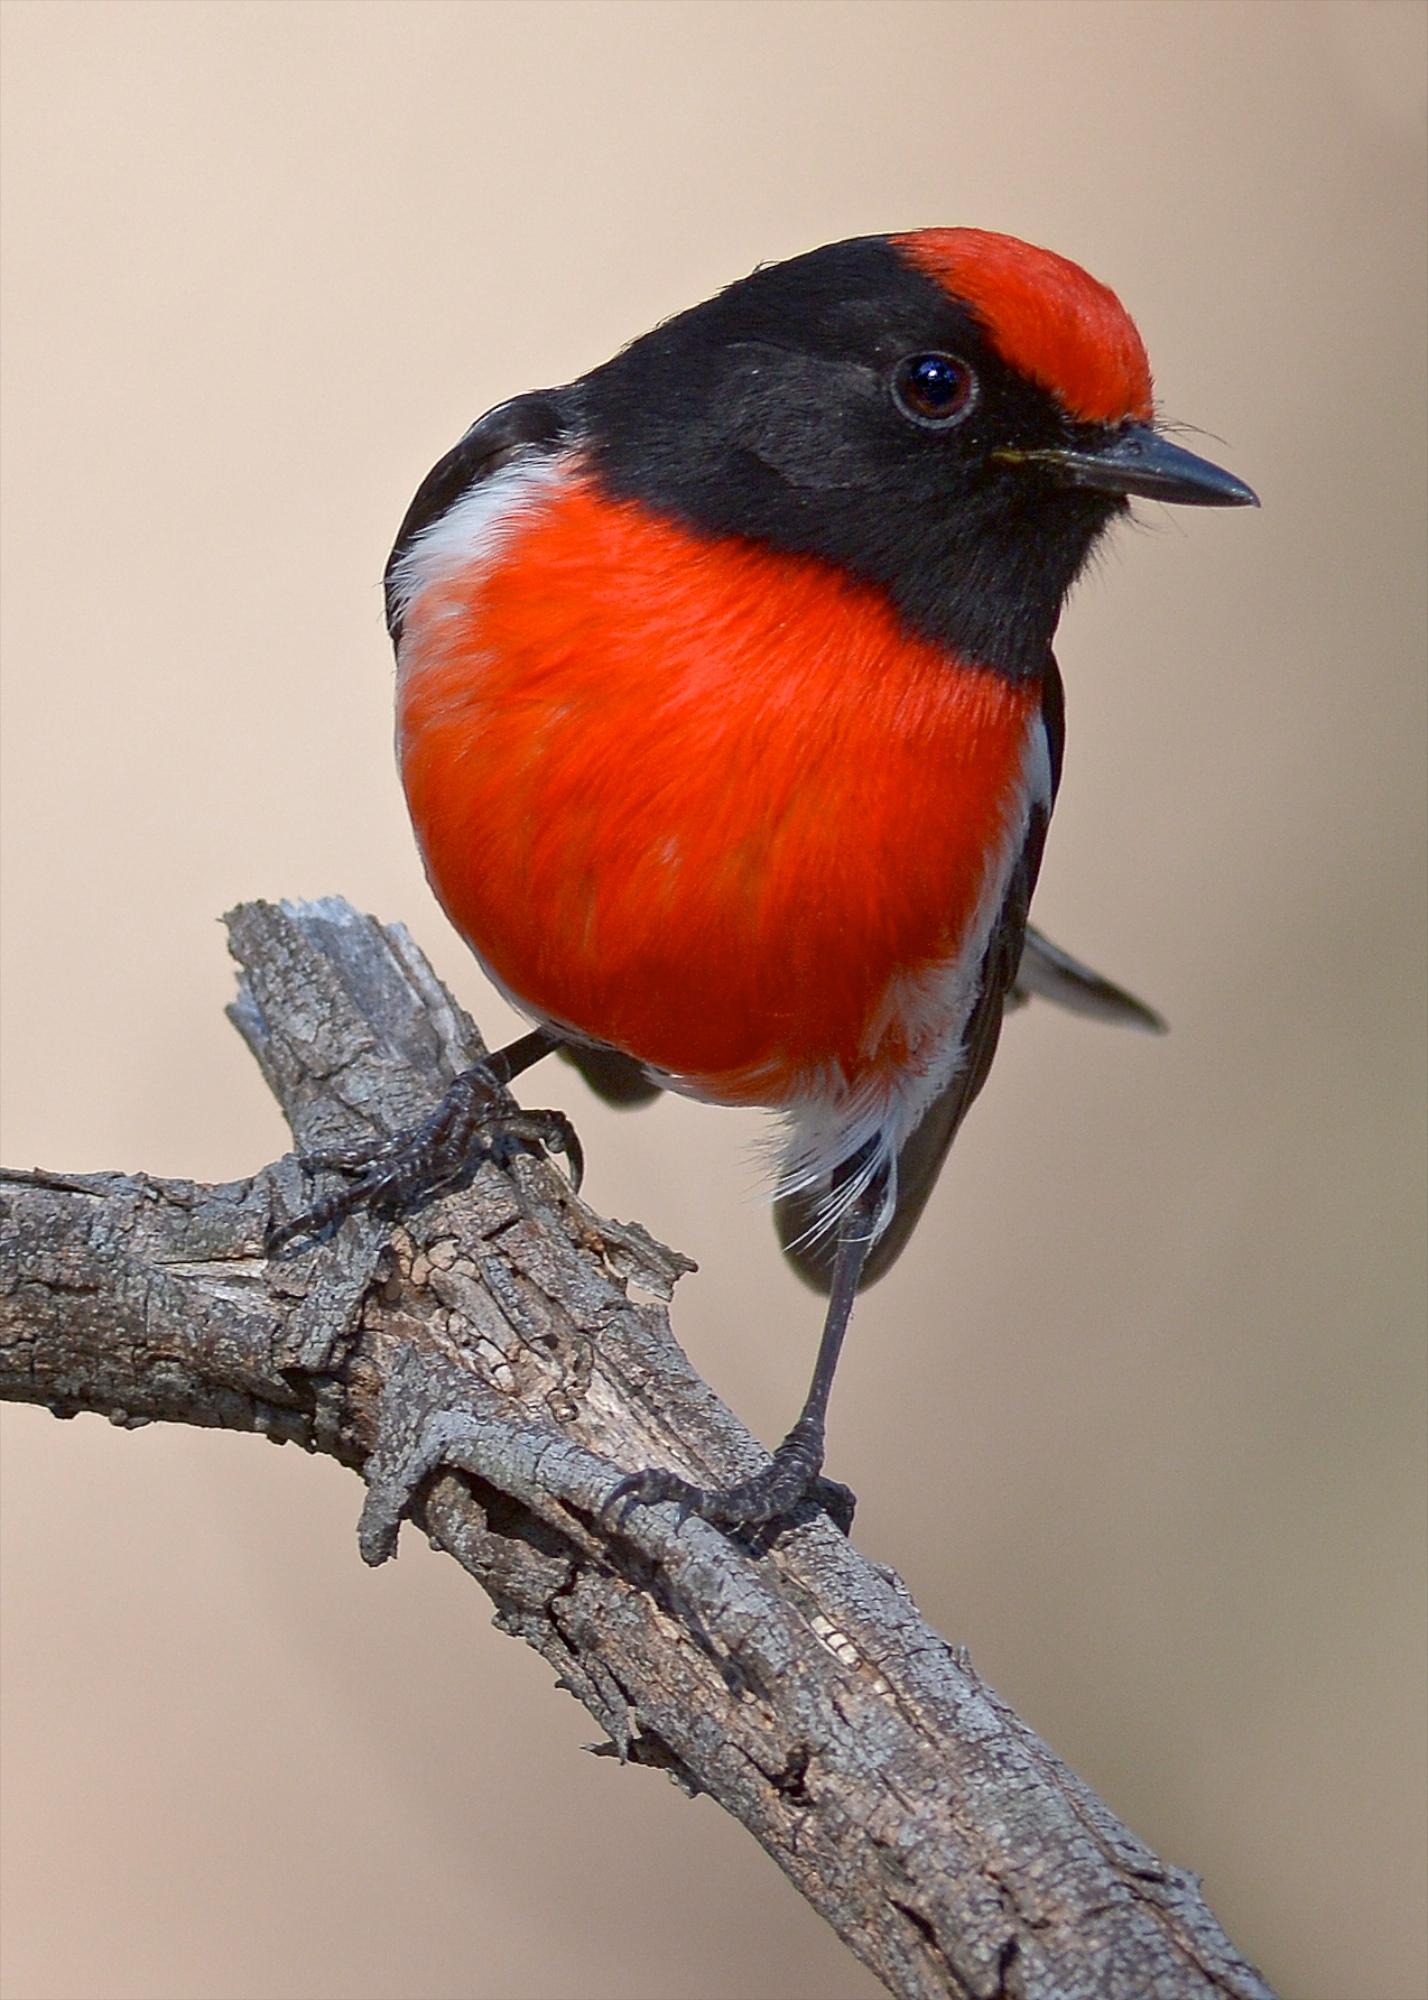 red bird nest and - photo #31